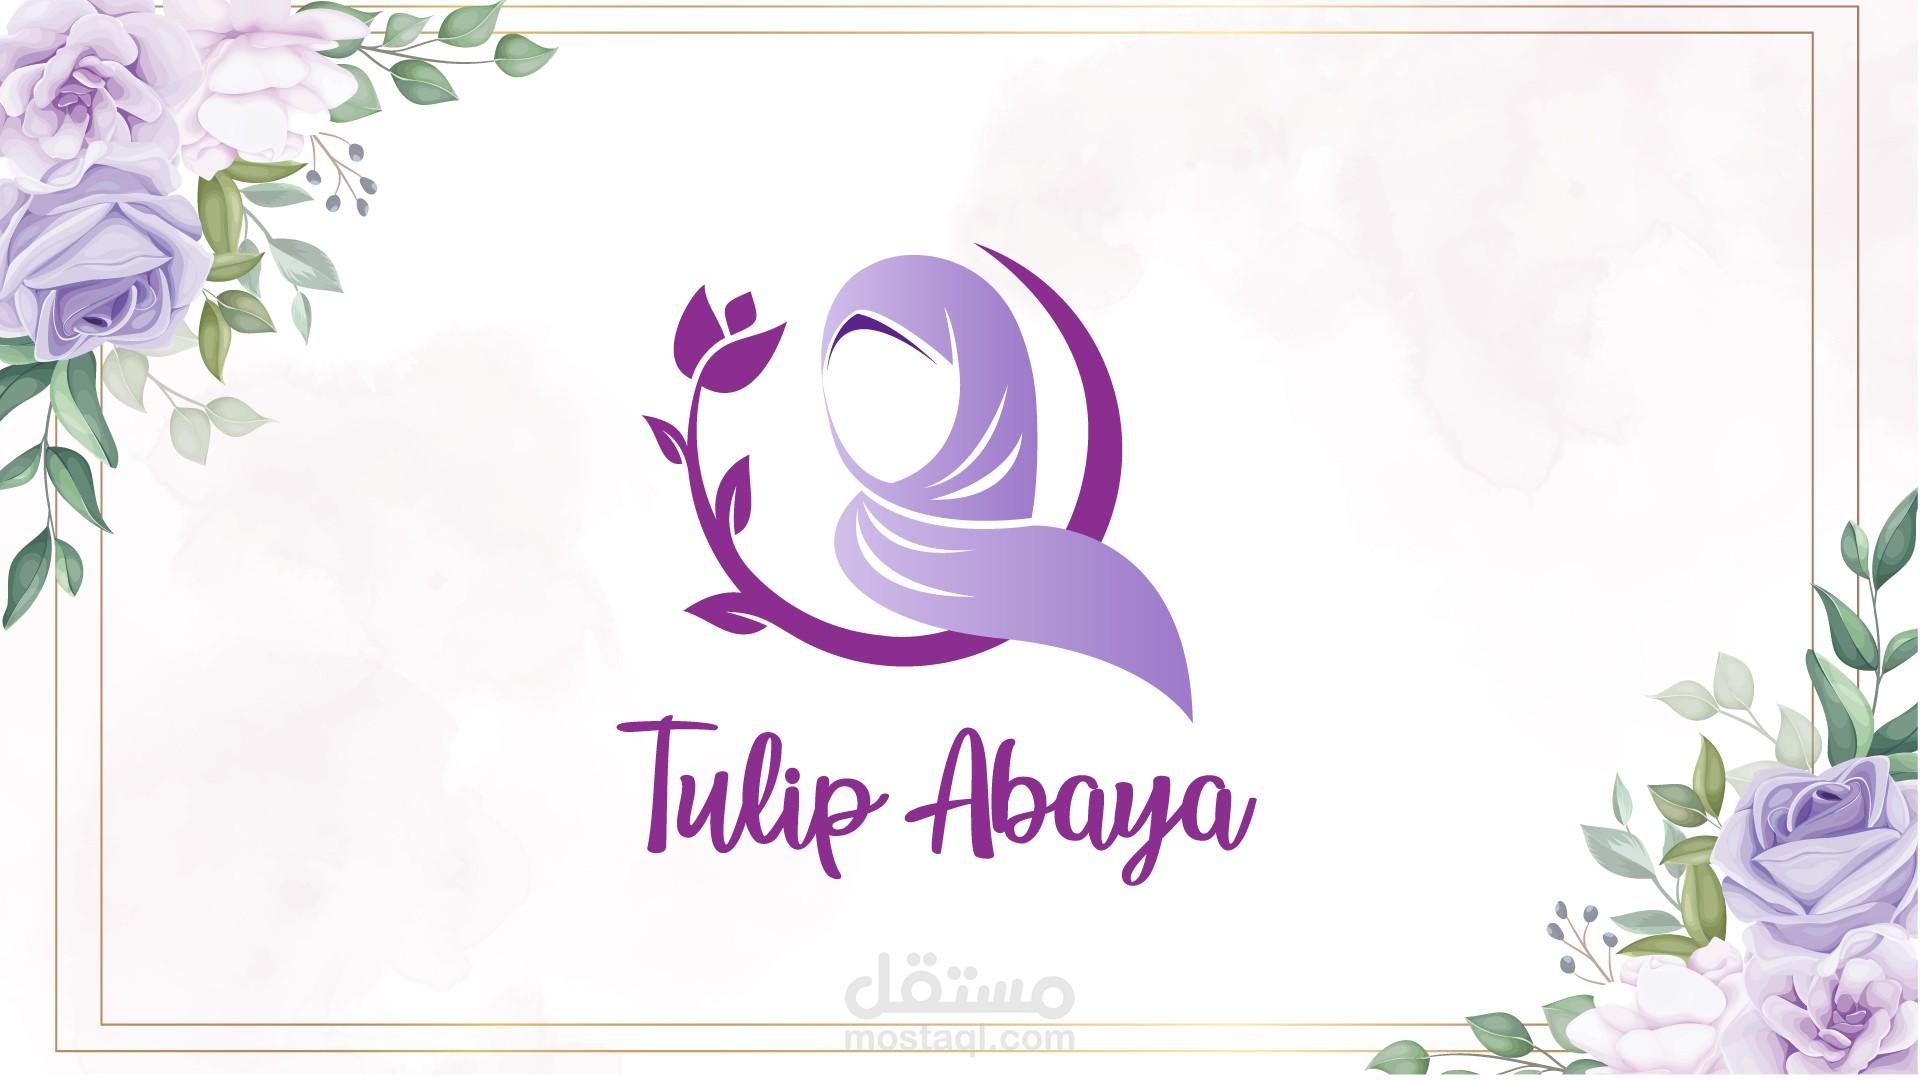 Tulip Abaya Brand Identity Guidline